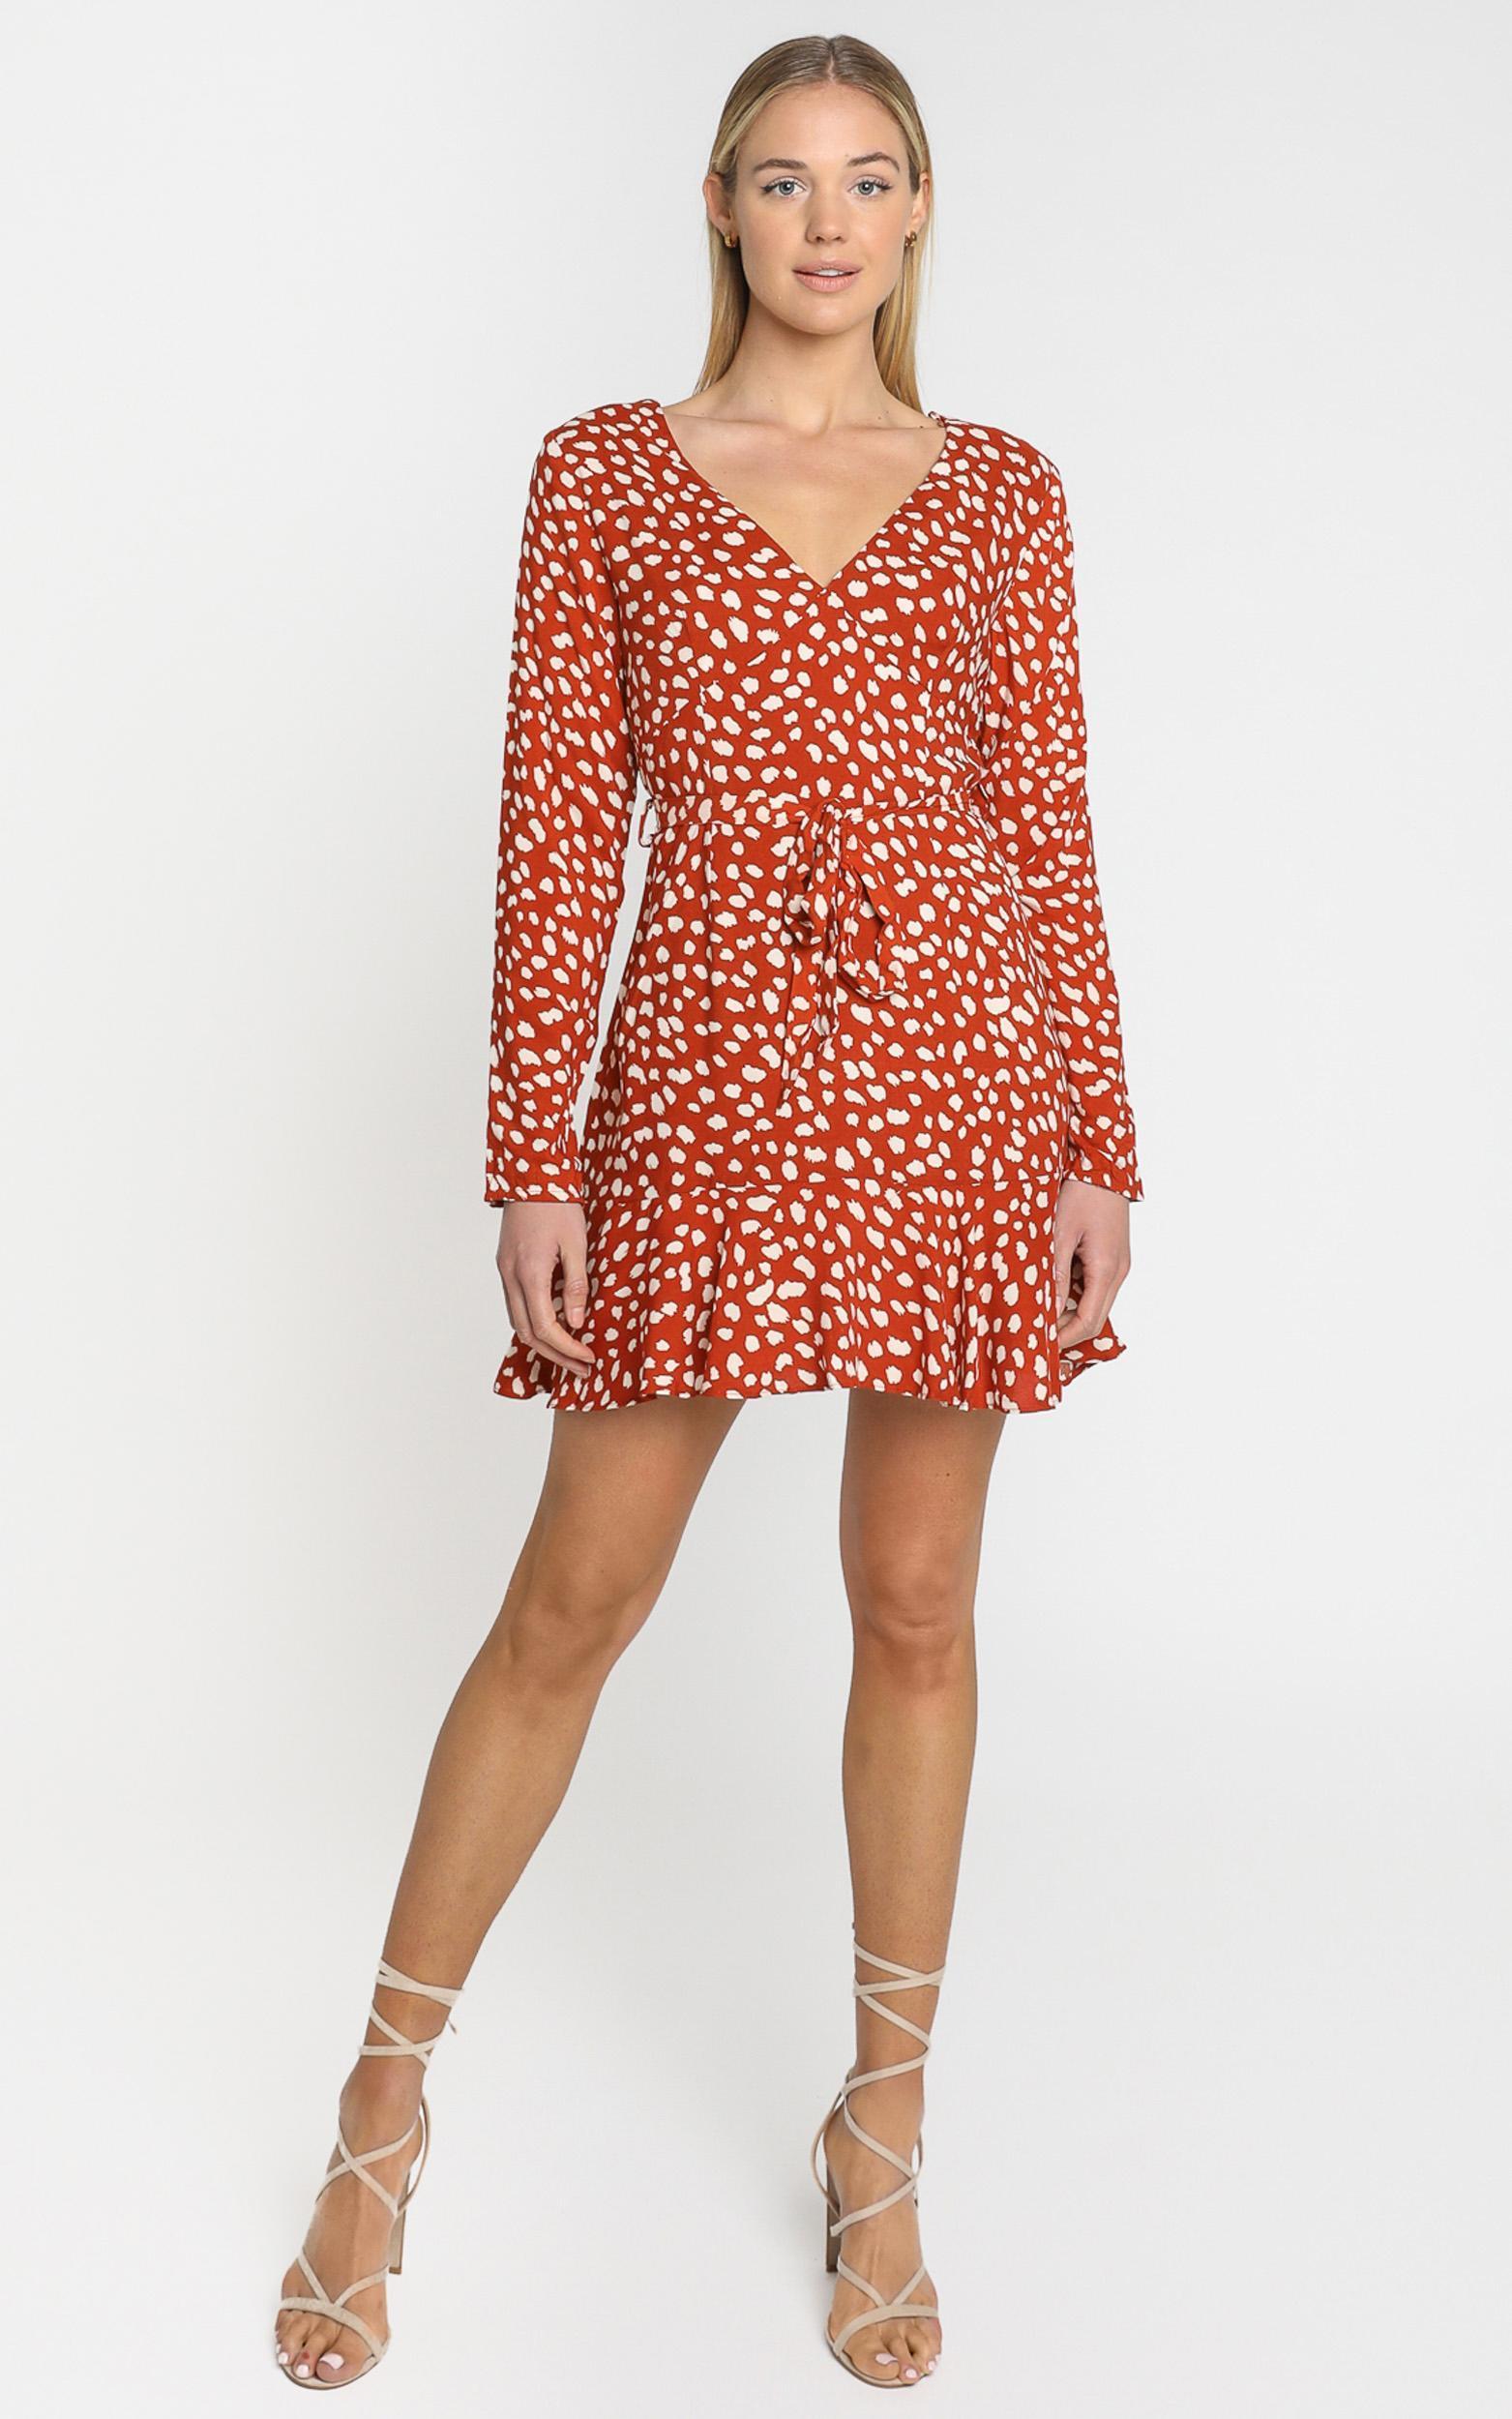 Farah Dress in Rust Spot - 6 (XS), Rust, hi-res image number null